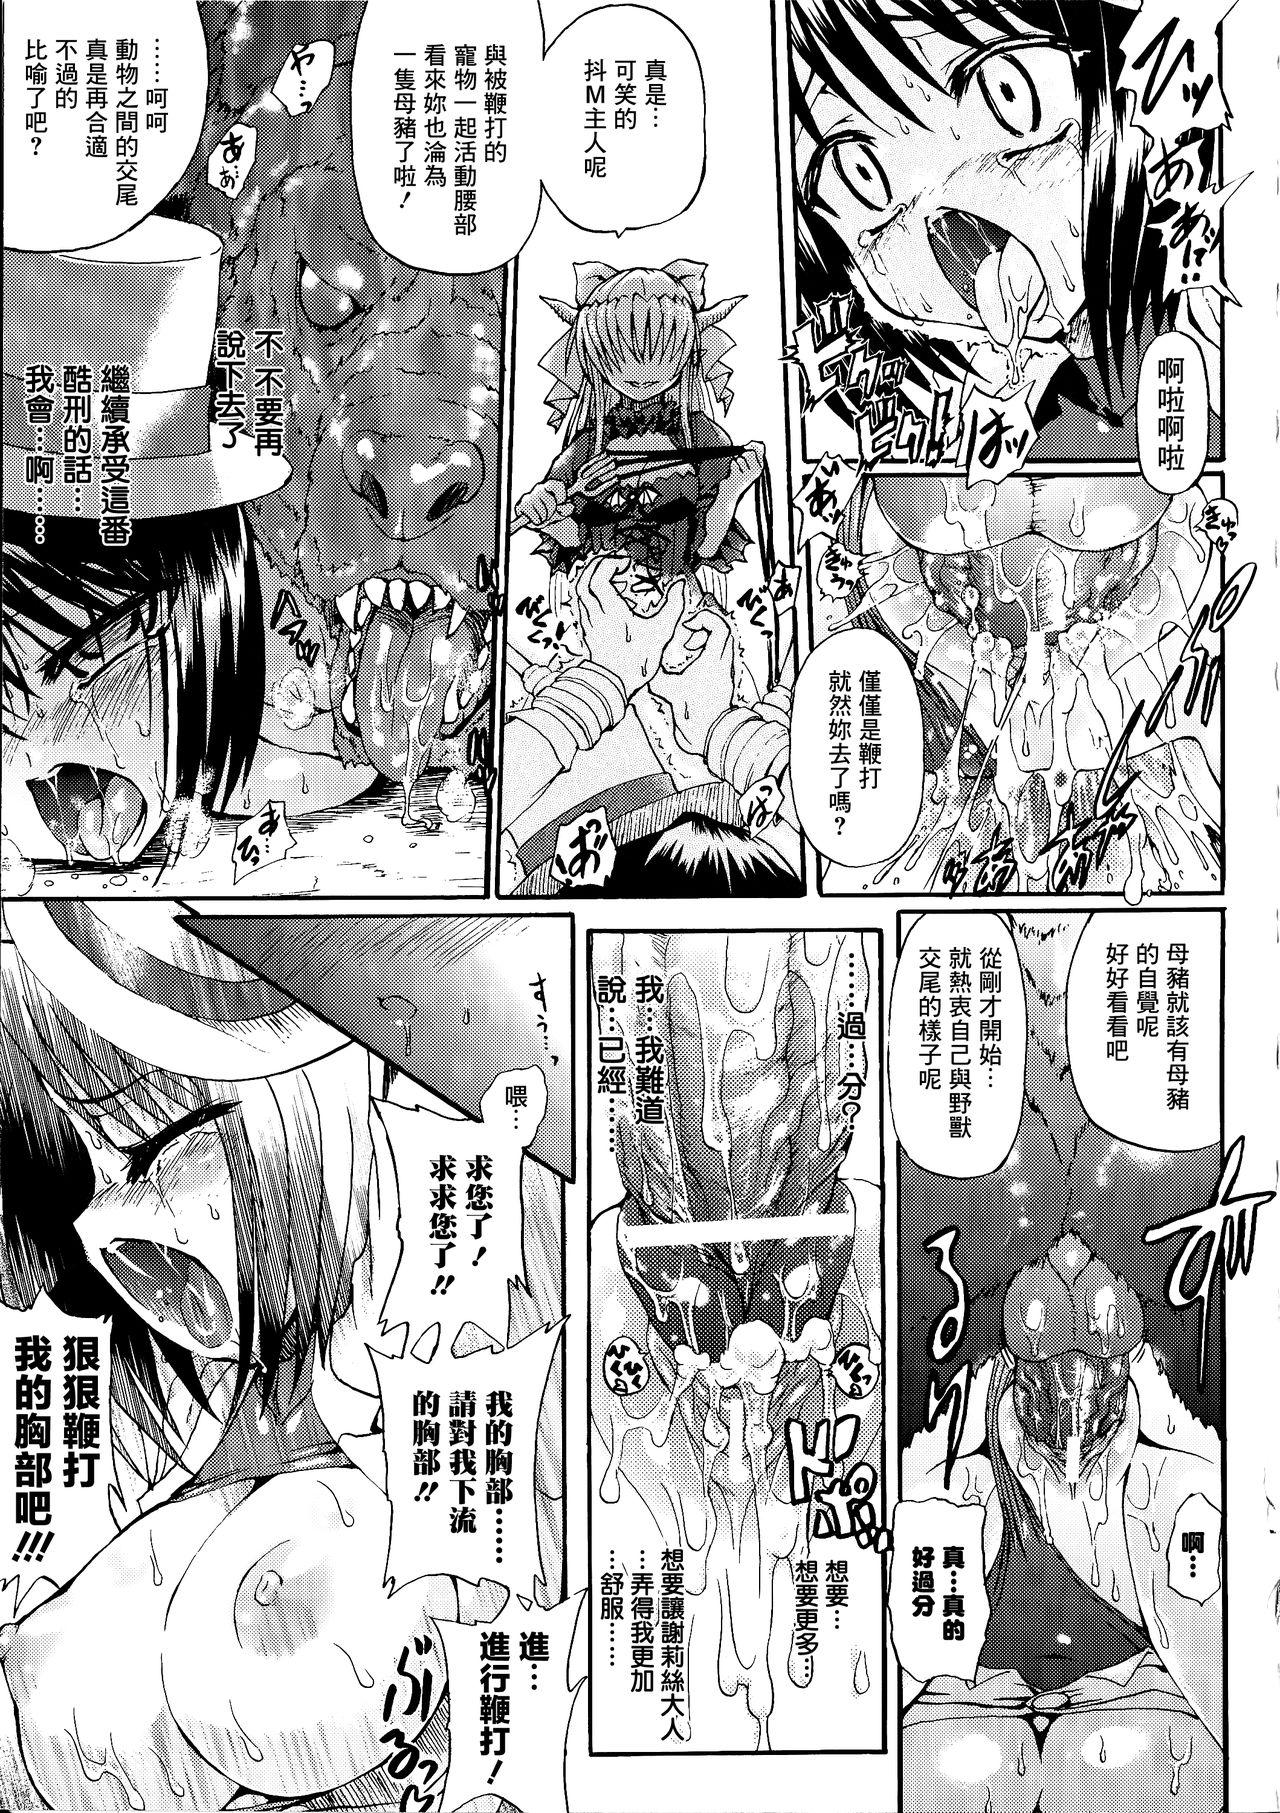 Ma ga Ochiru Yoru Demonic Imitator CH.1-7 95